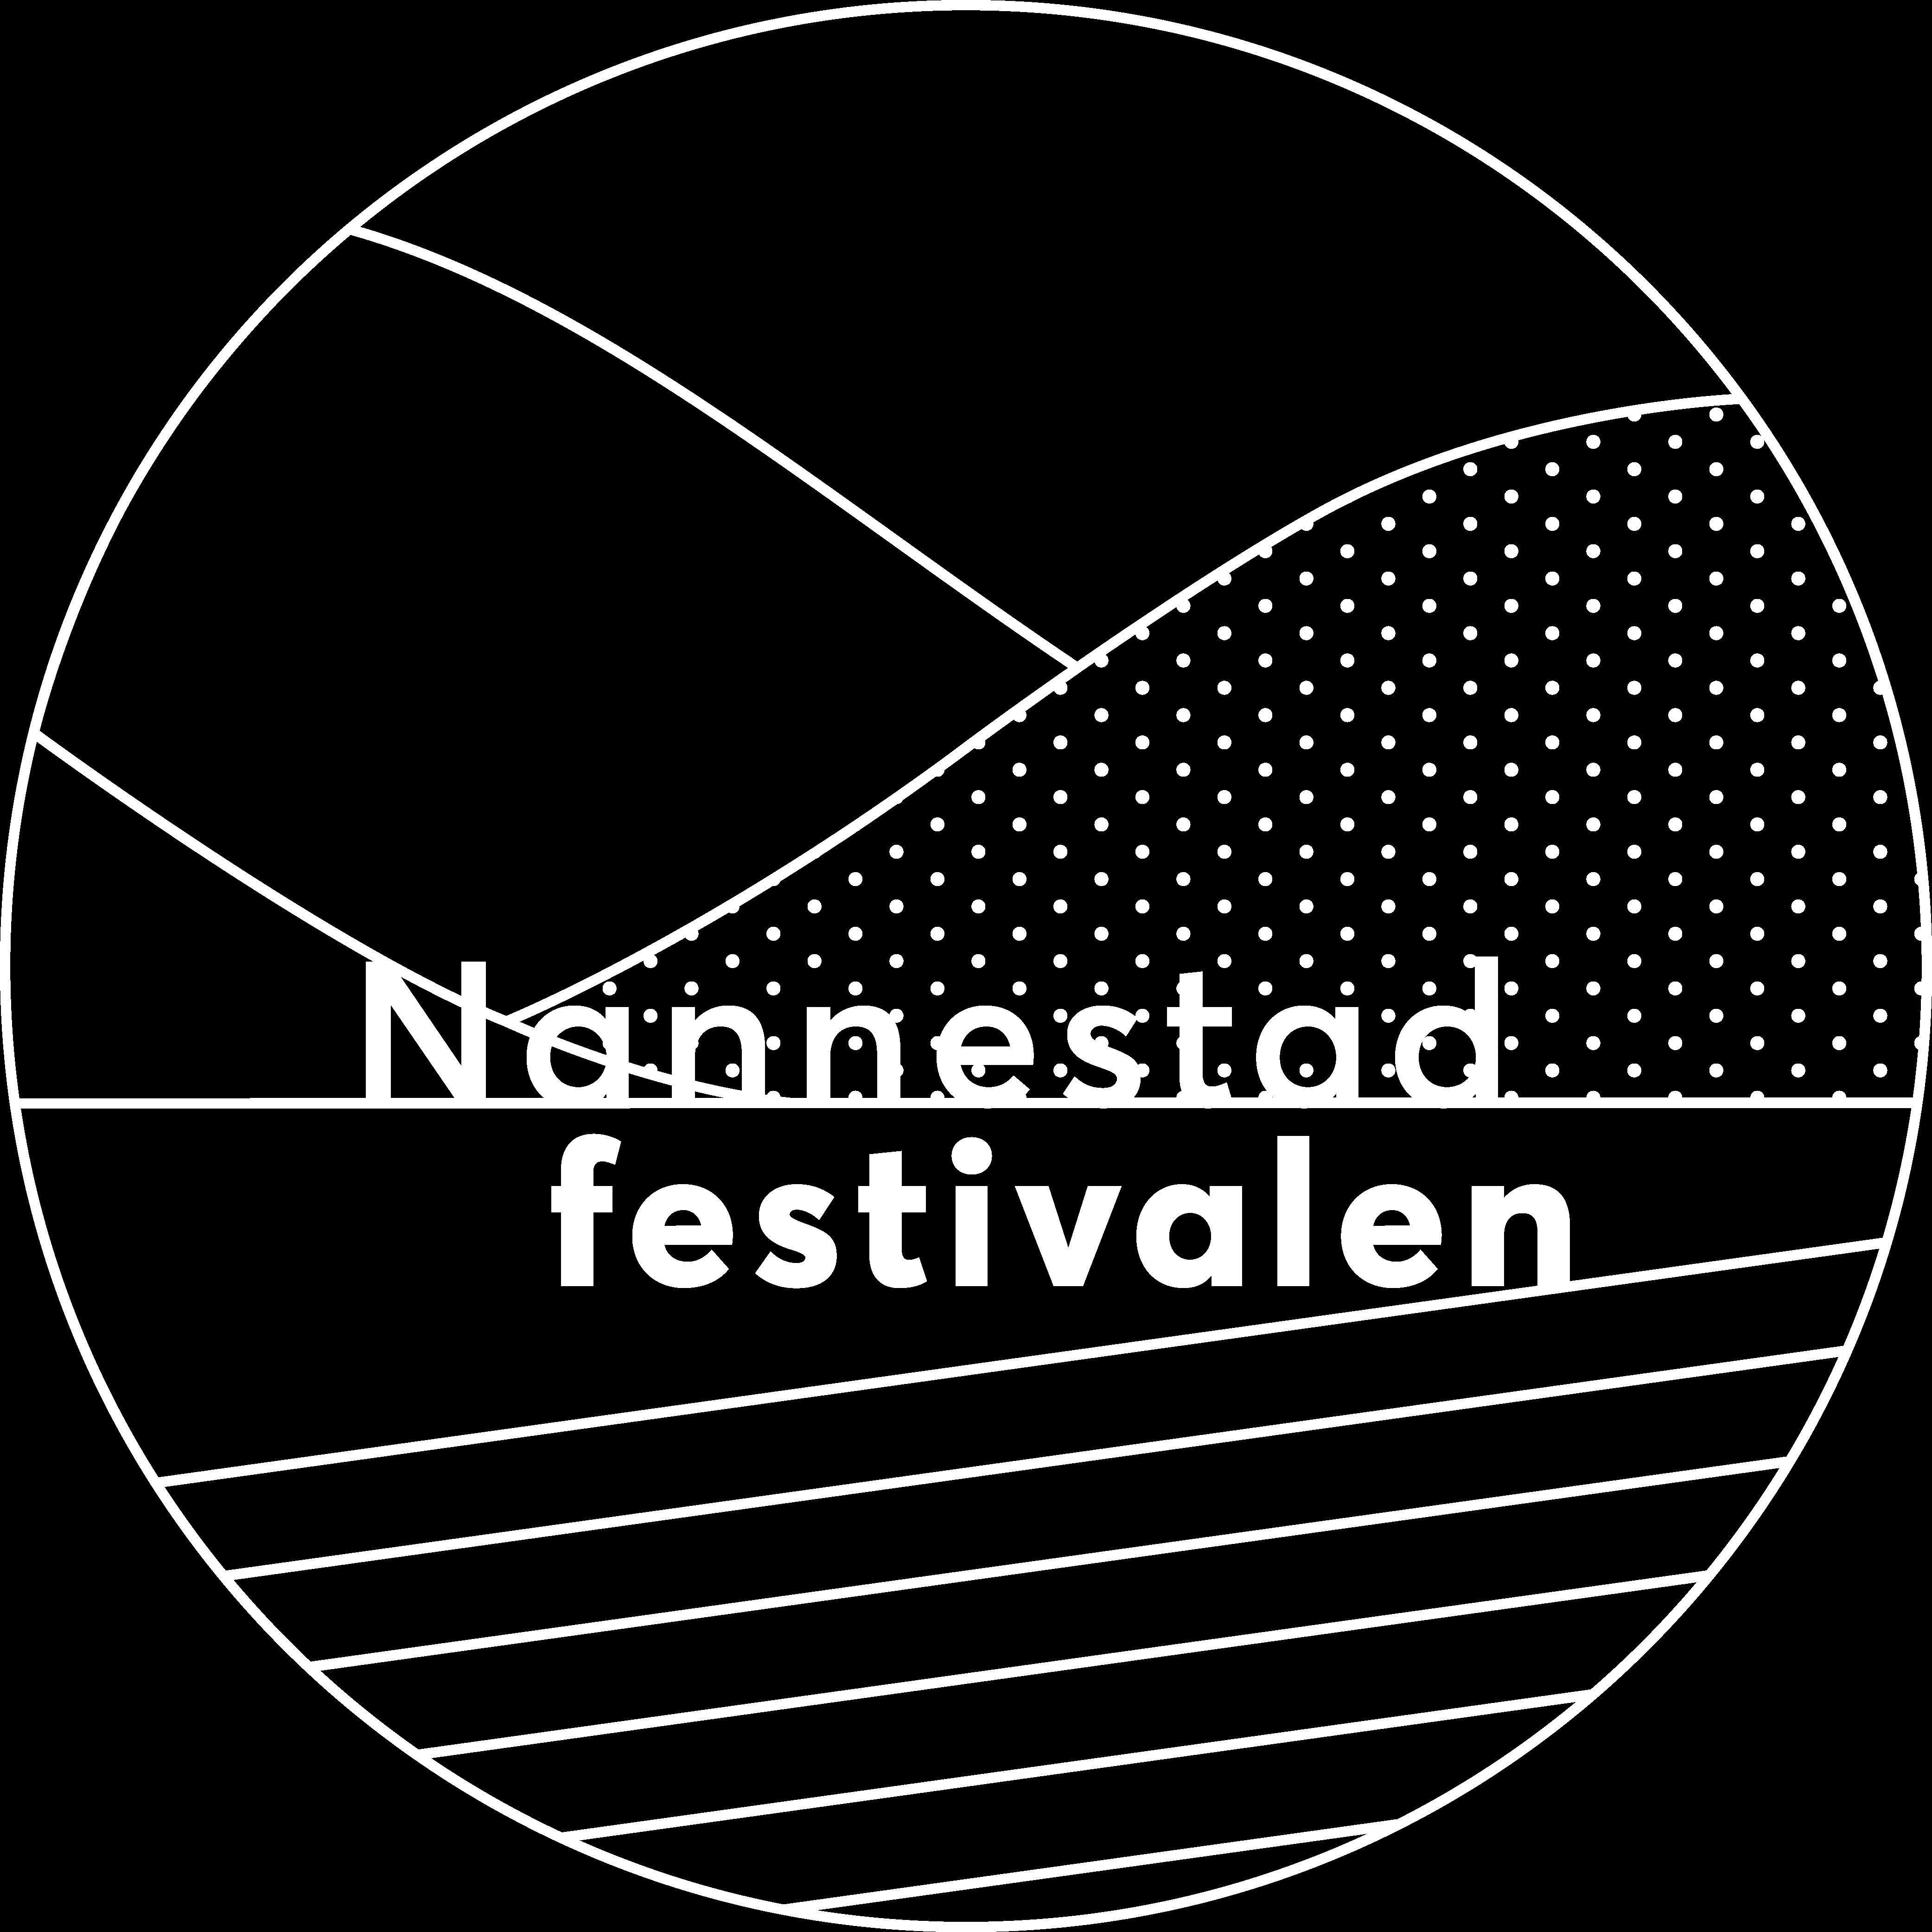 Nannestadfestivalen-logo i hvit